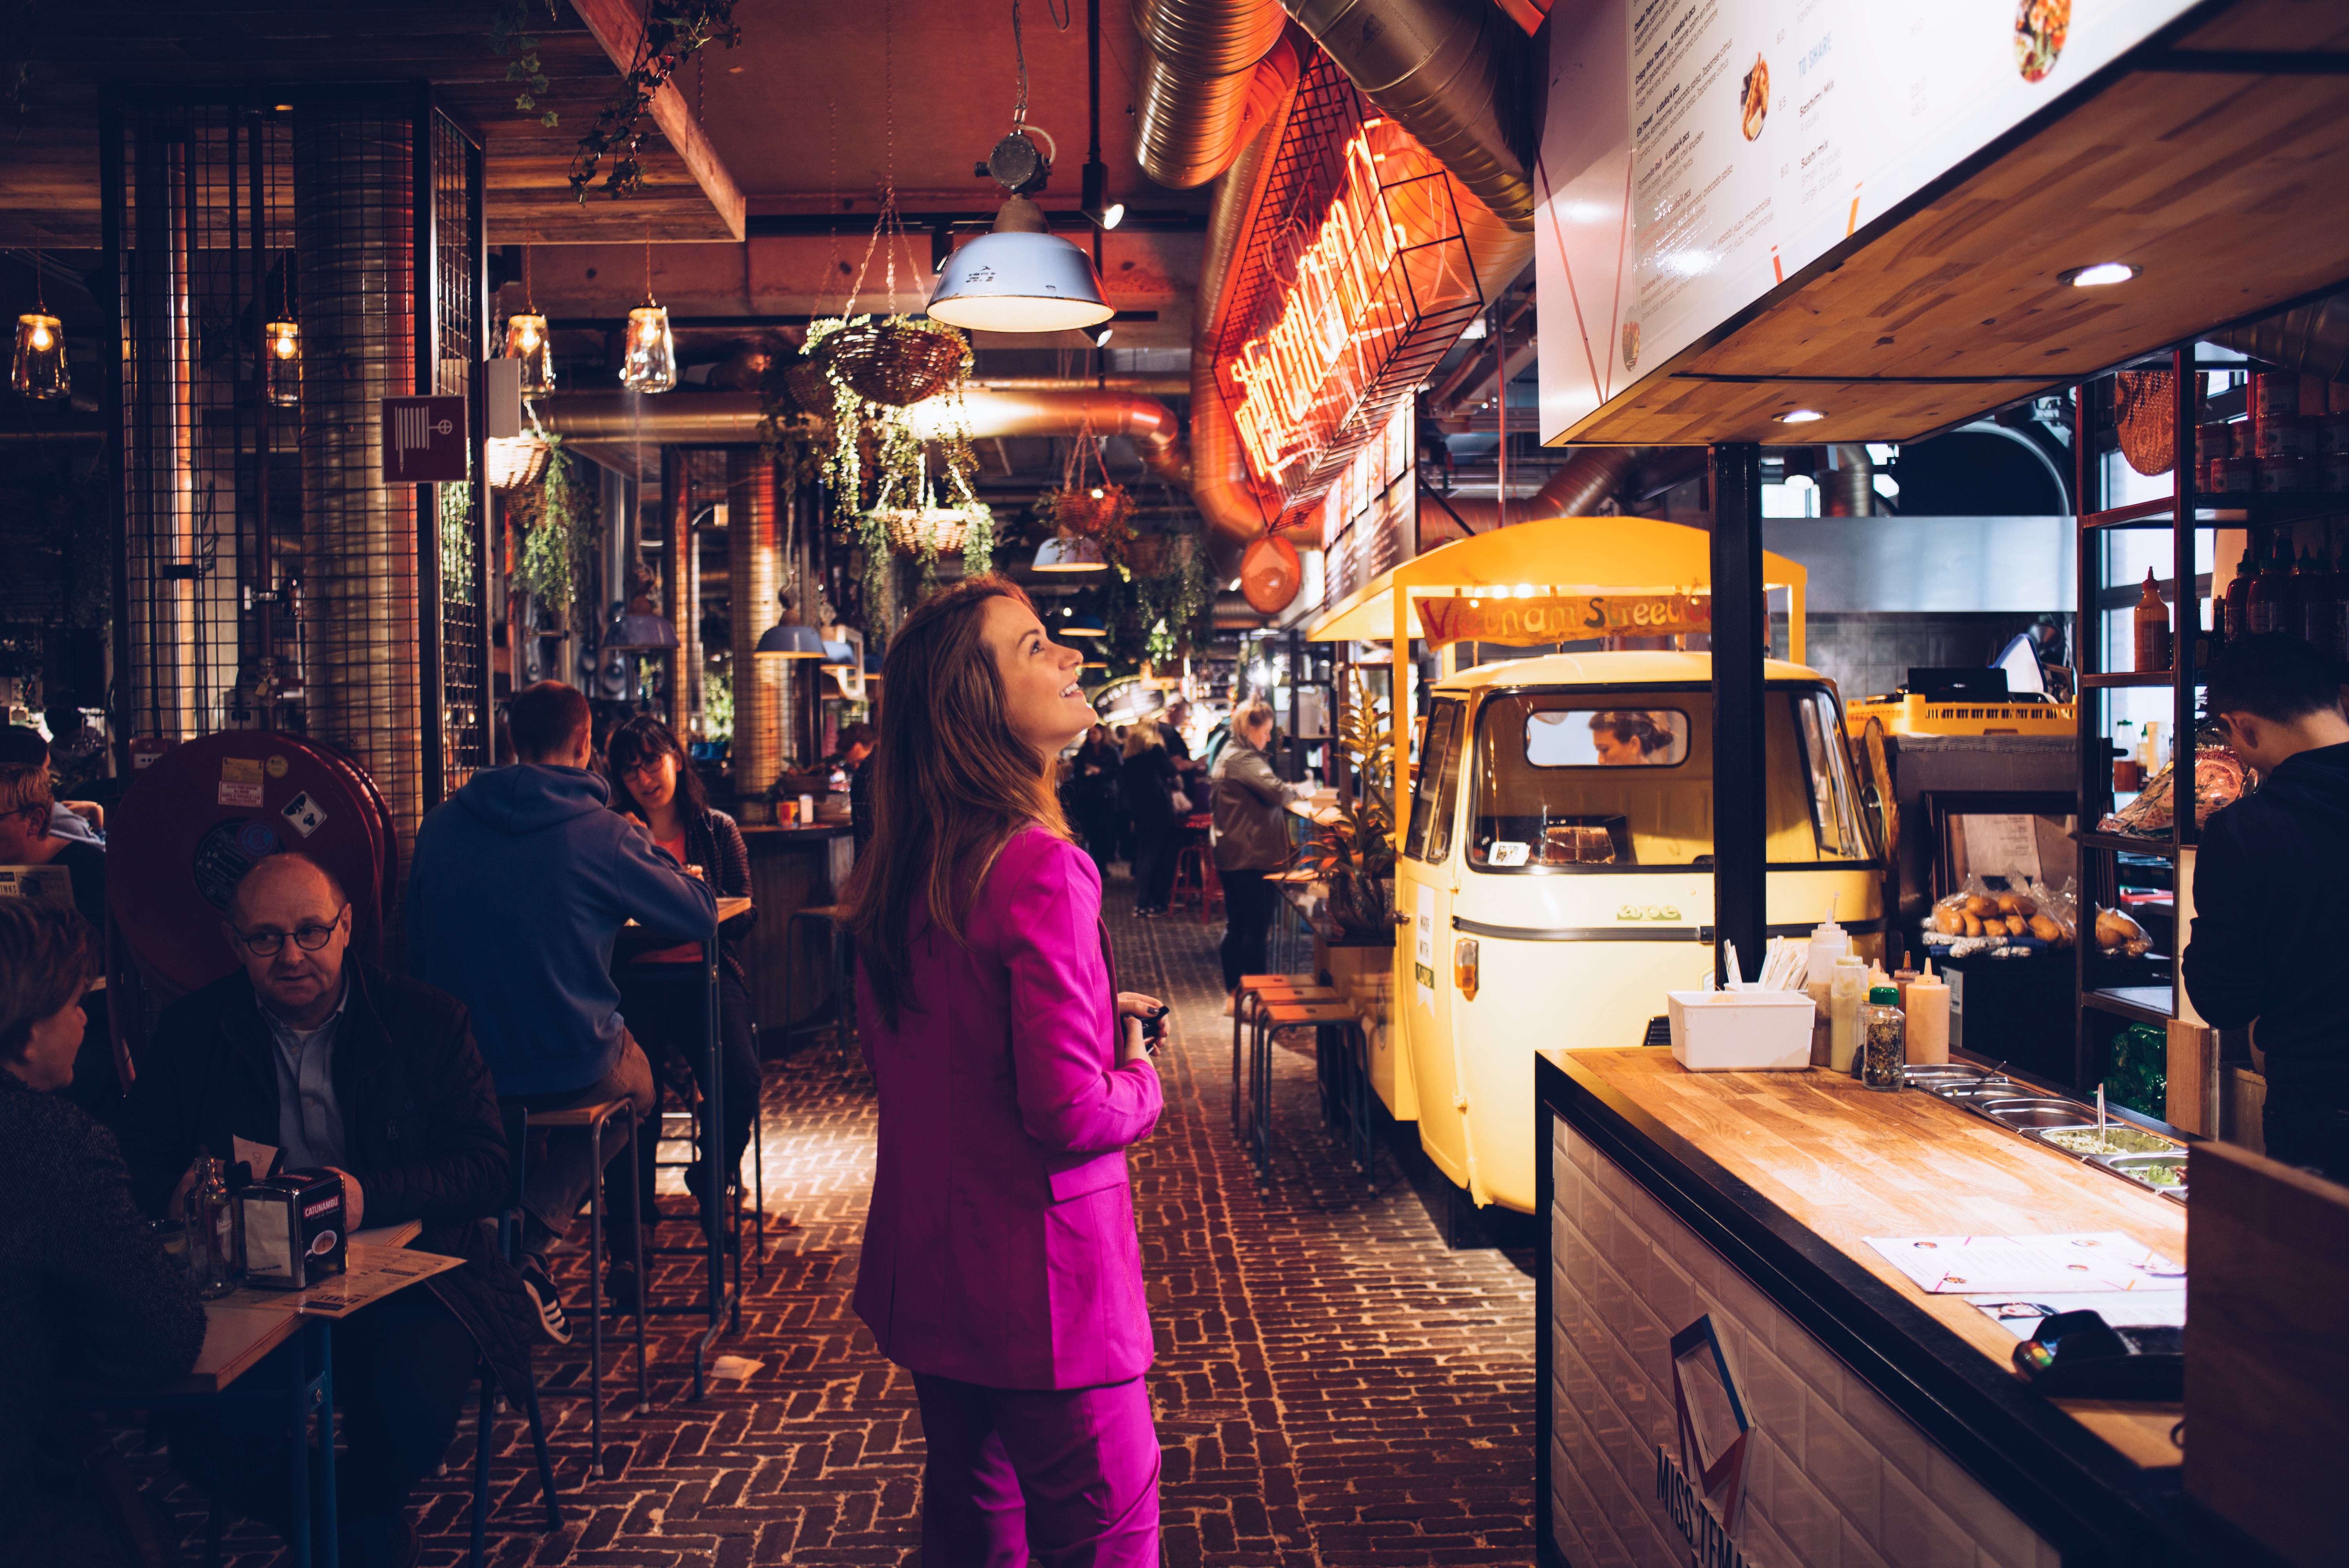 Down town gourmet market, eindhoven, eten, markthal, foodhal, foodie, food, pizza, nachos, friet, sushi, bitterballen, uiteten, lunch, sfeer, gezellig, foodporn